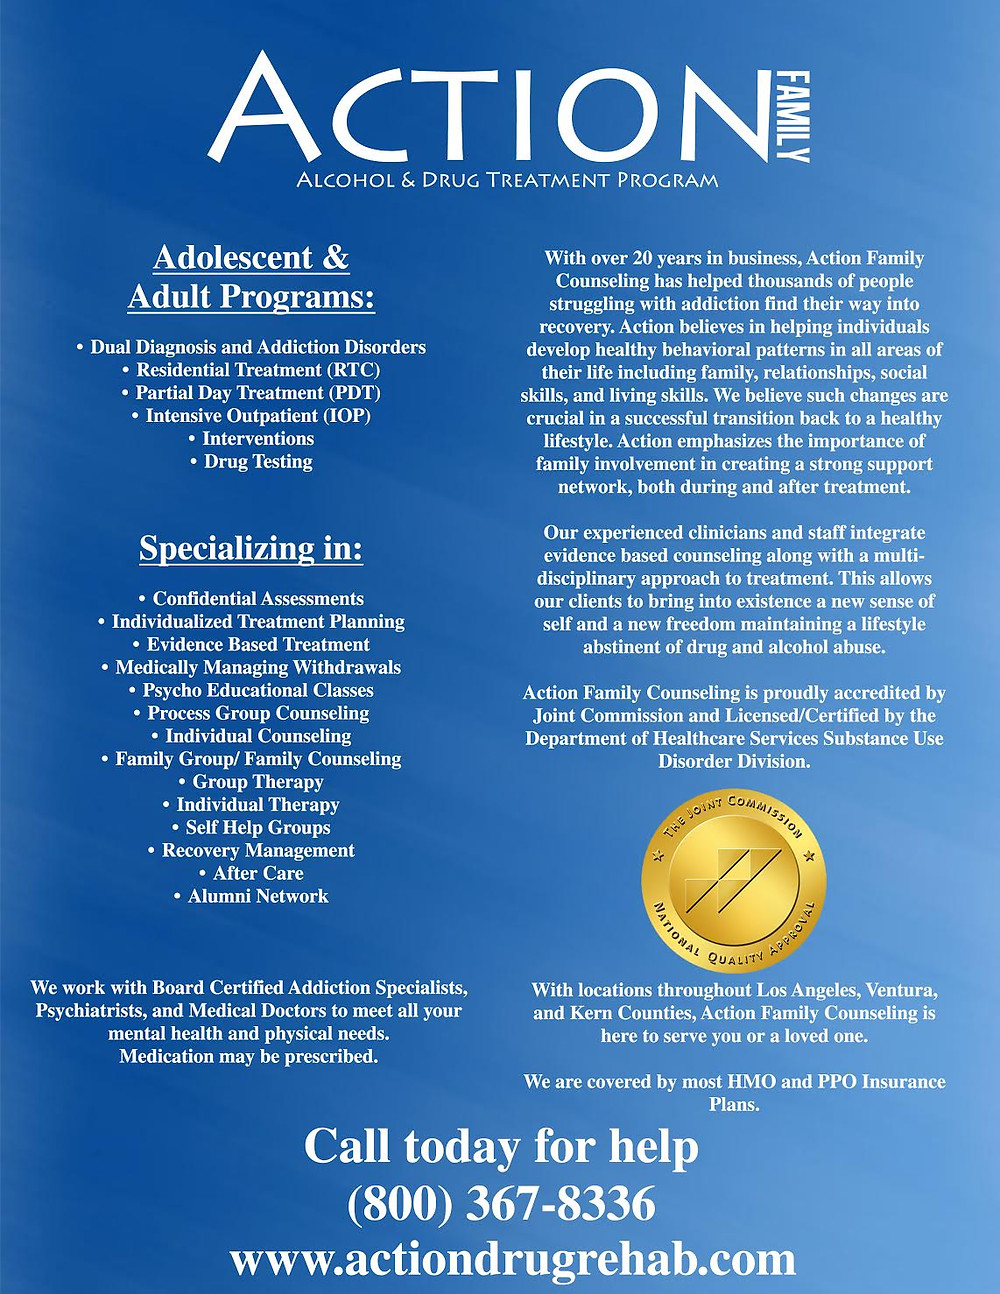 Action Drug Rehabilitation Centers Flyer